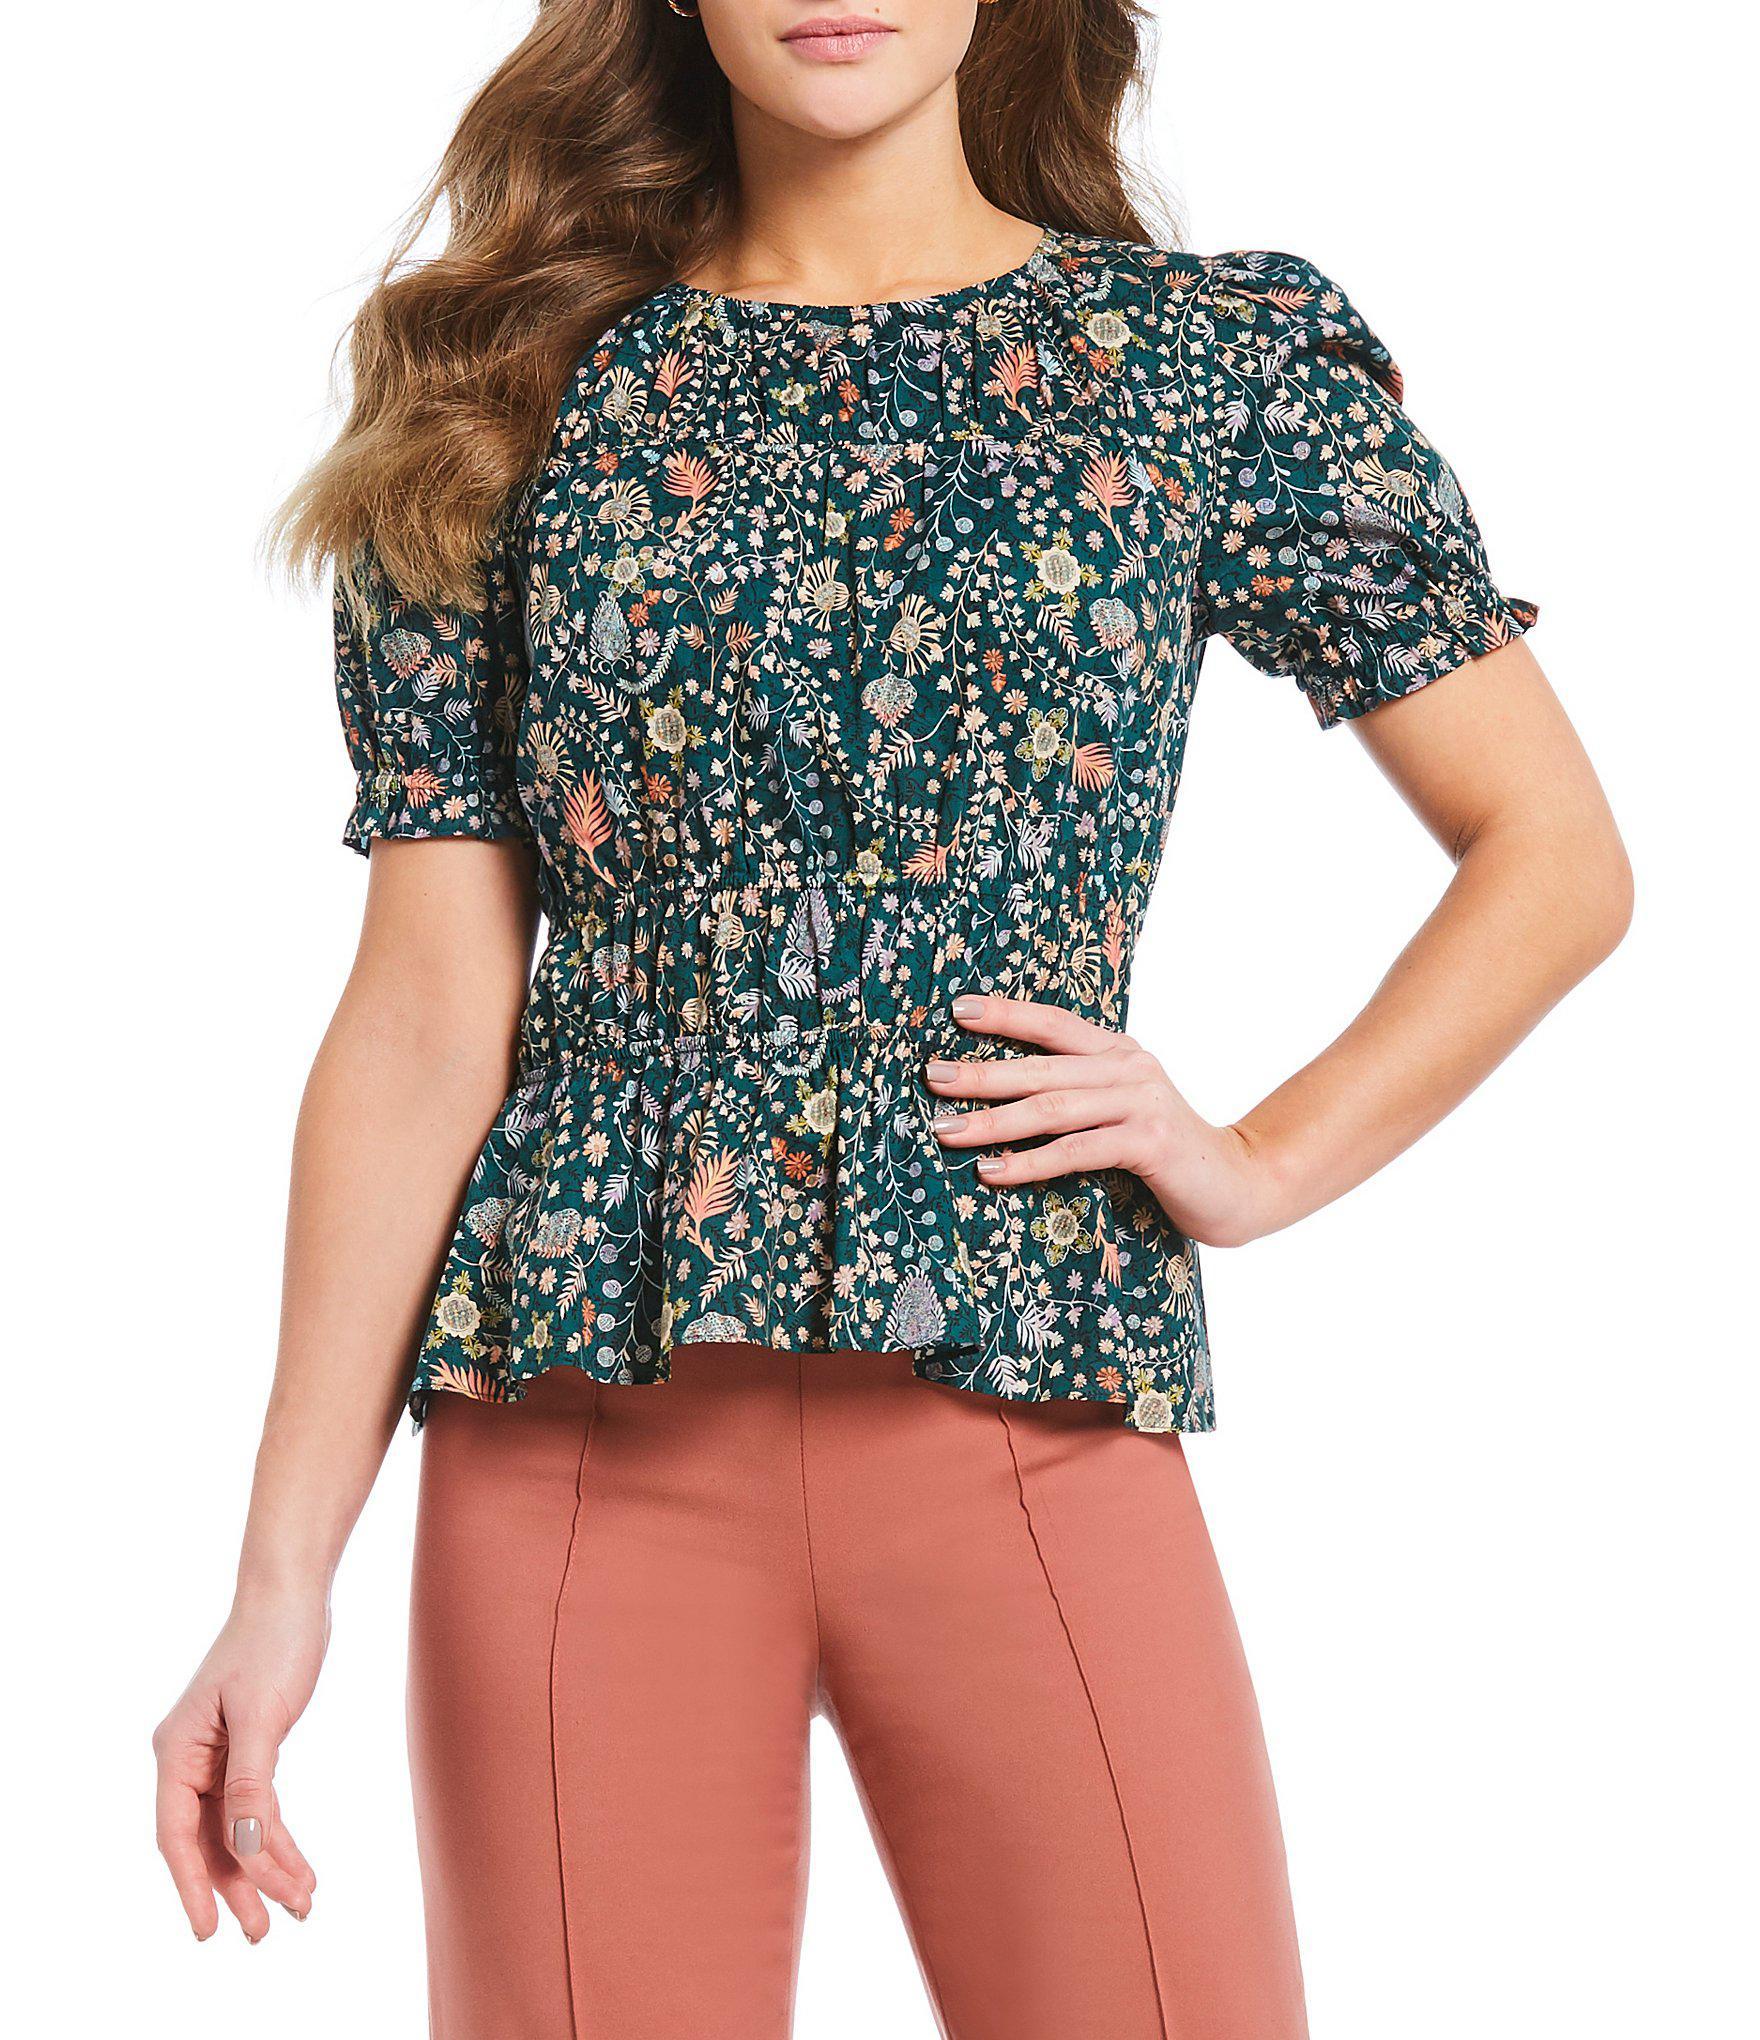 d71c38e0ba385 Lyst - Antonio Melani Made With Liberty Fabrics Mia Floral Print ...